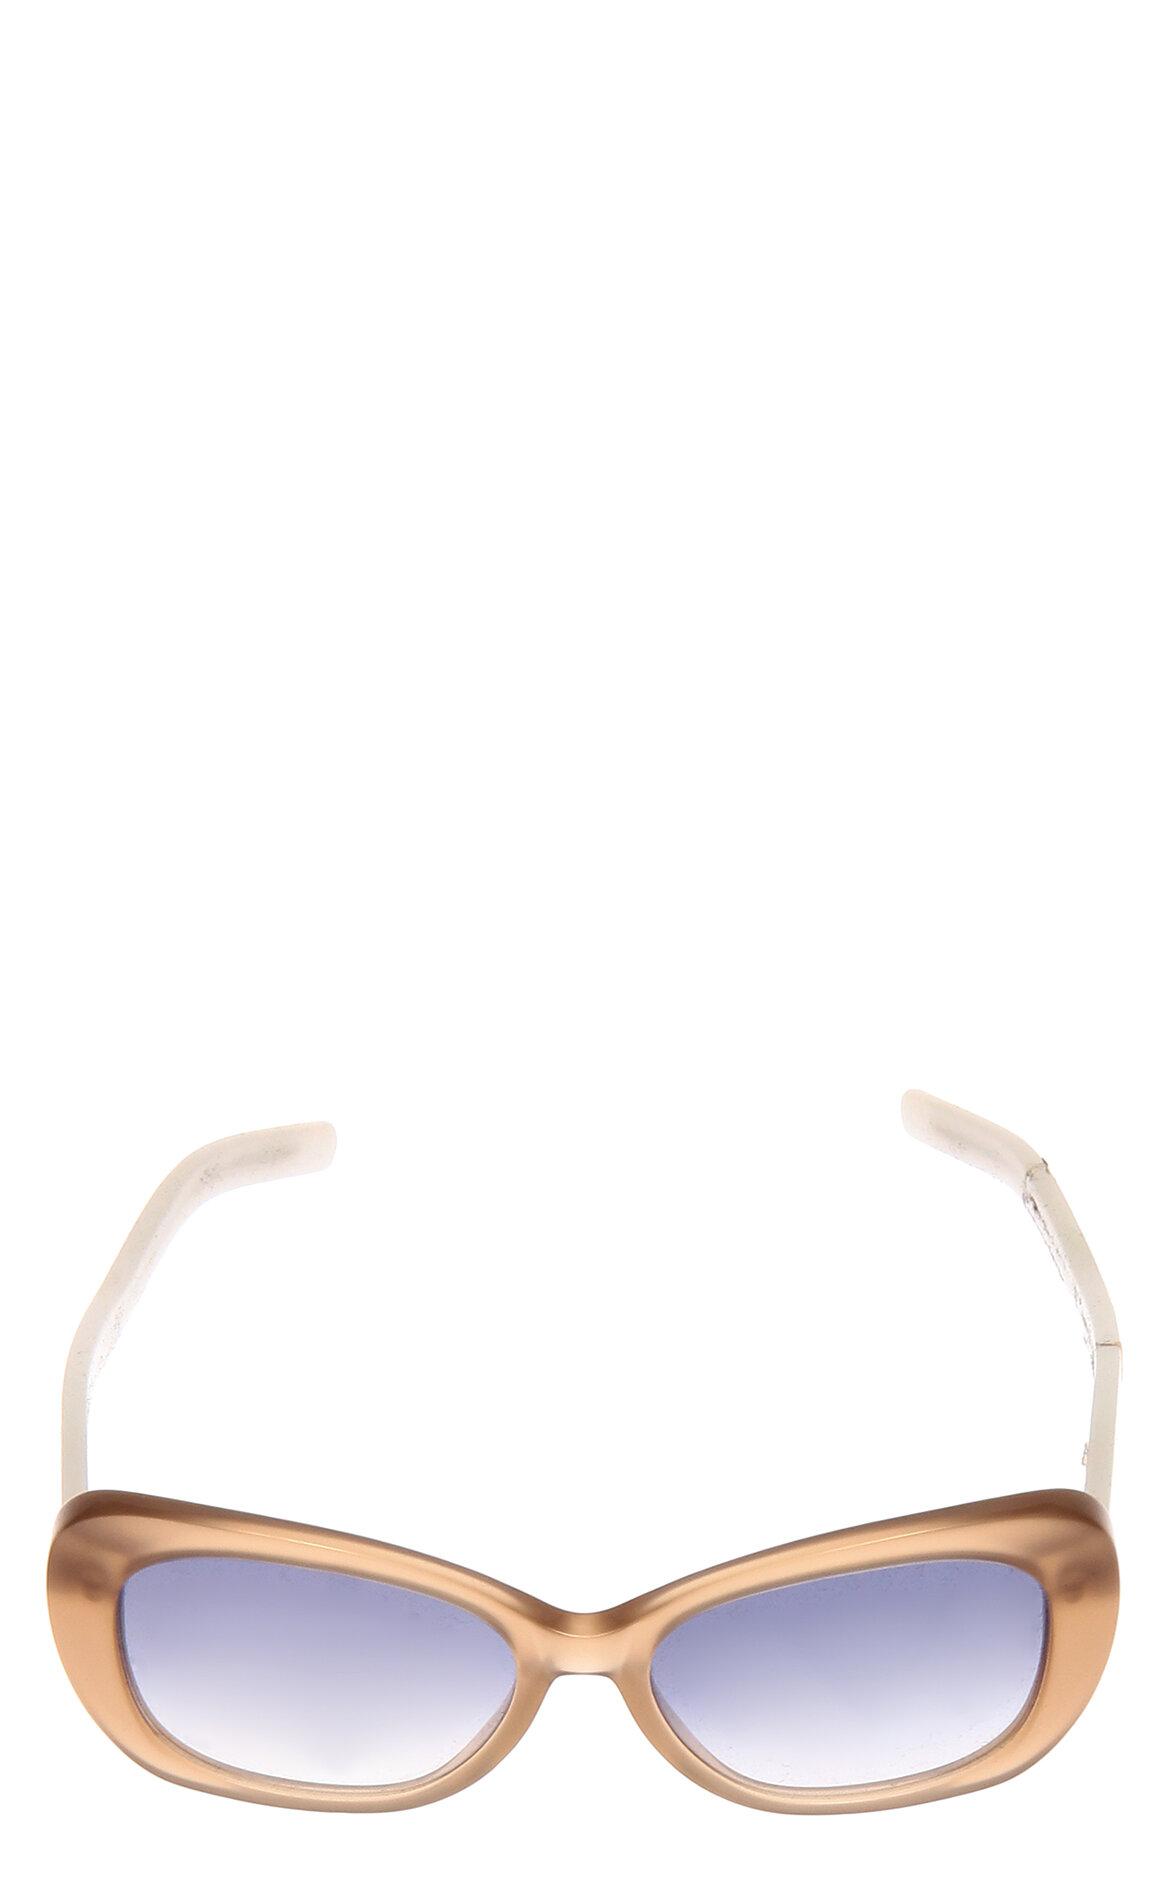 Alberta Ferretti -Alberta Ferretti Güneş Gözlüğü